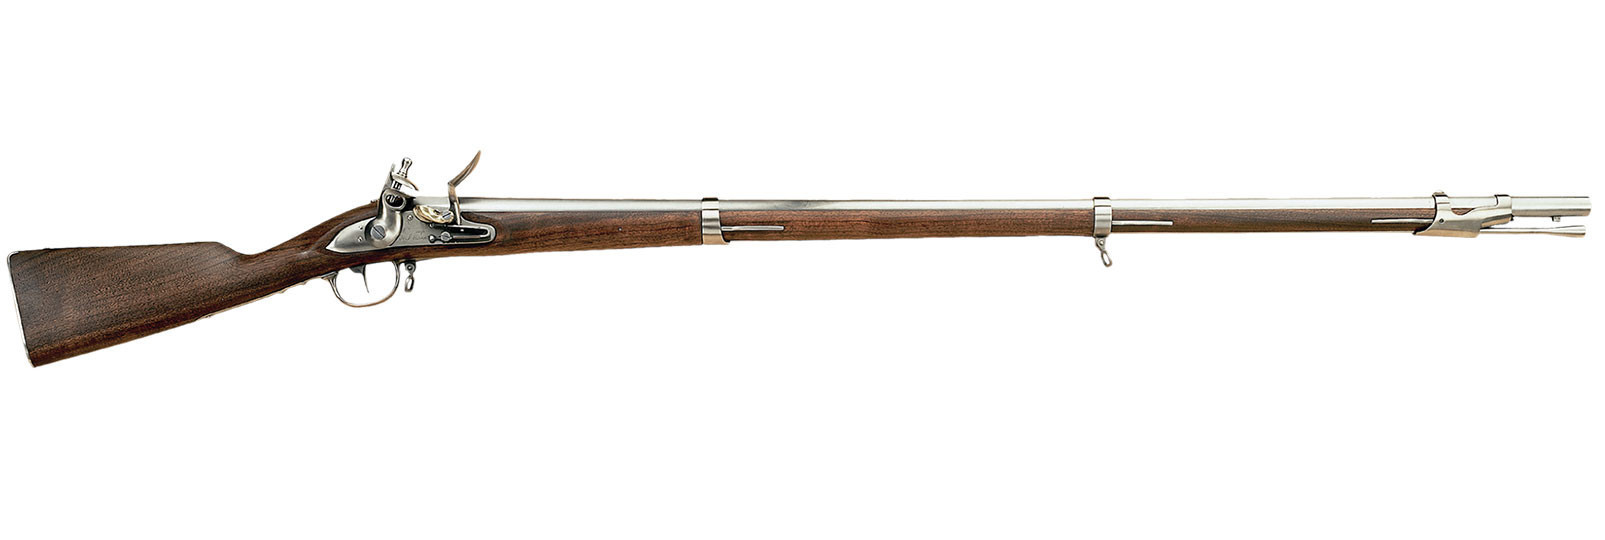 1777 Corrige An IX